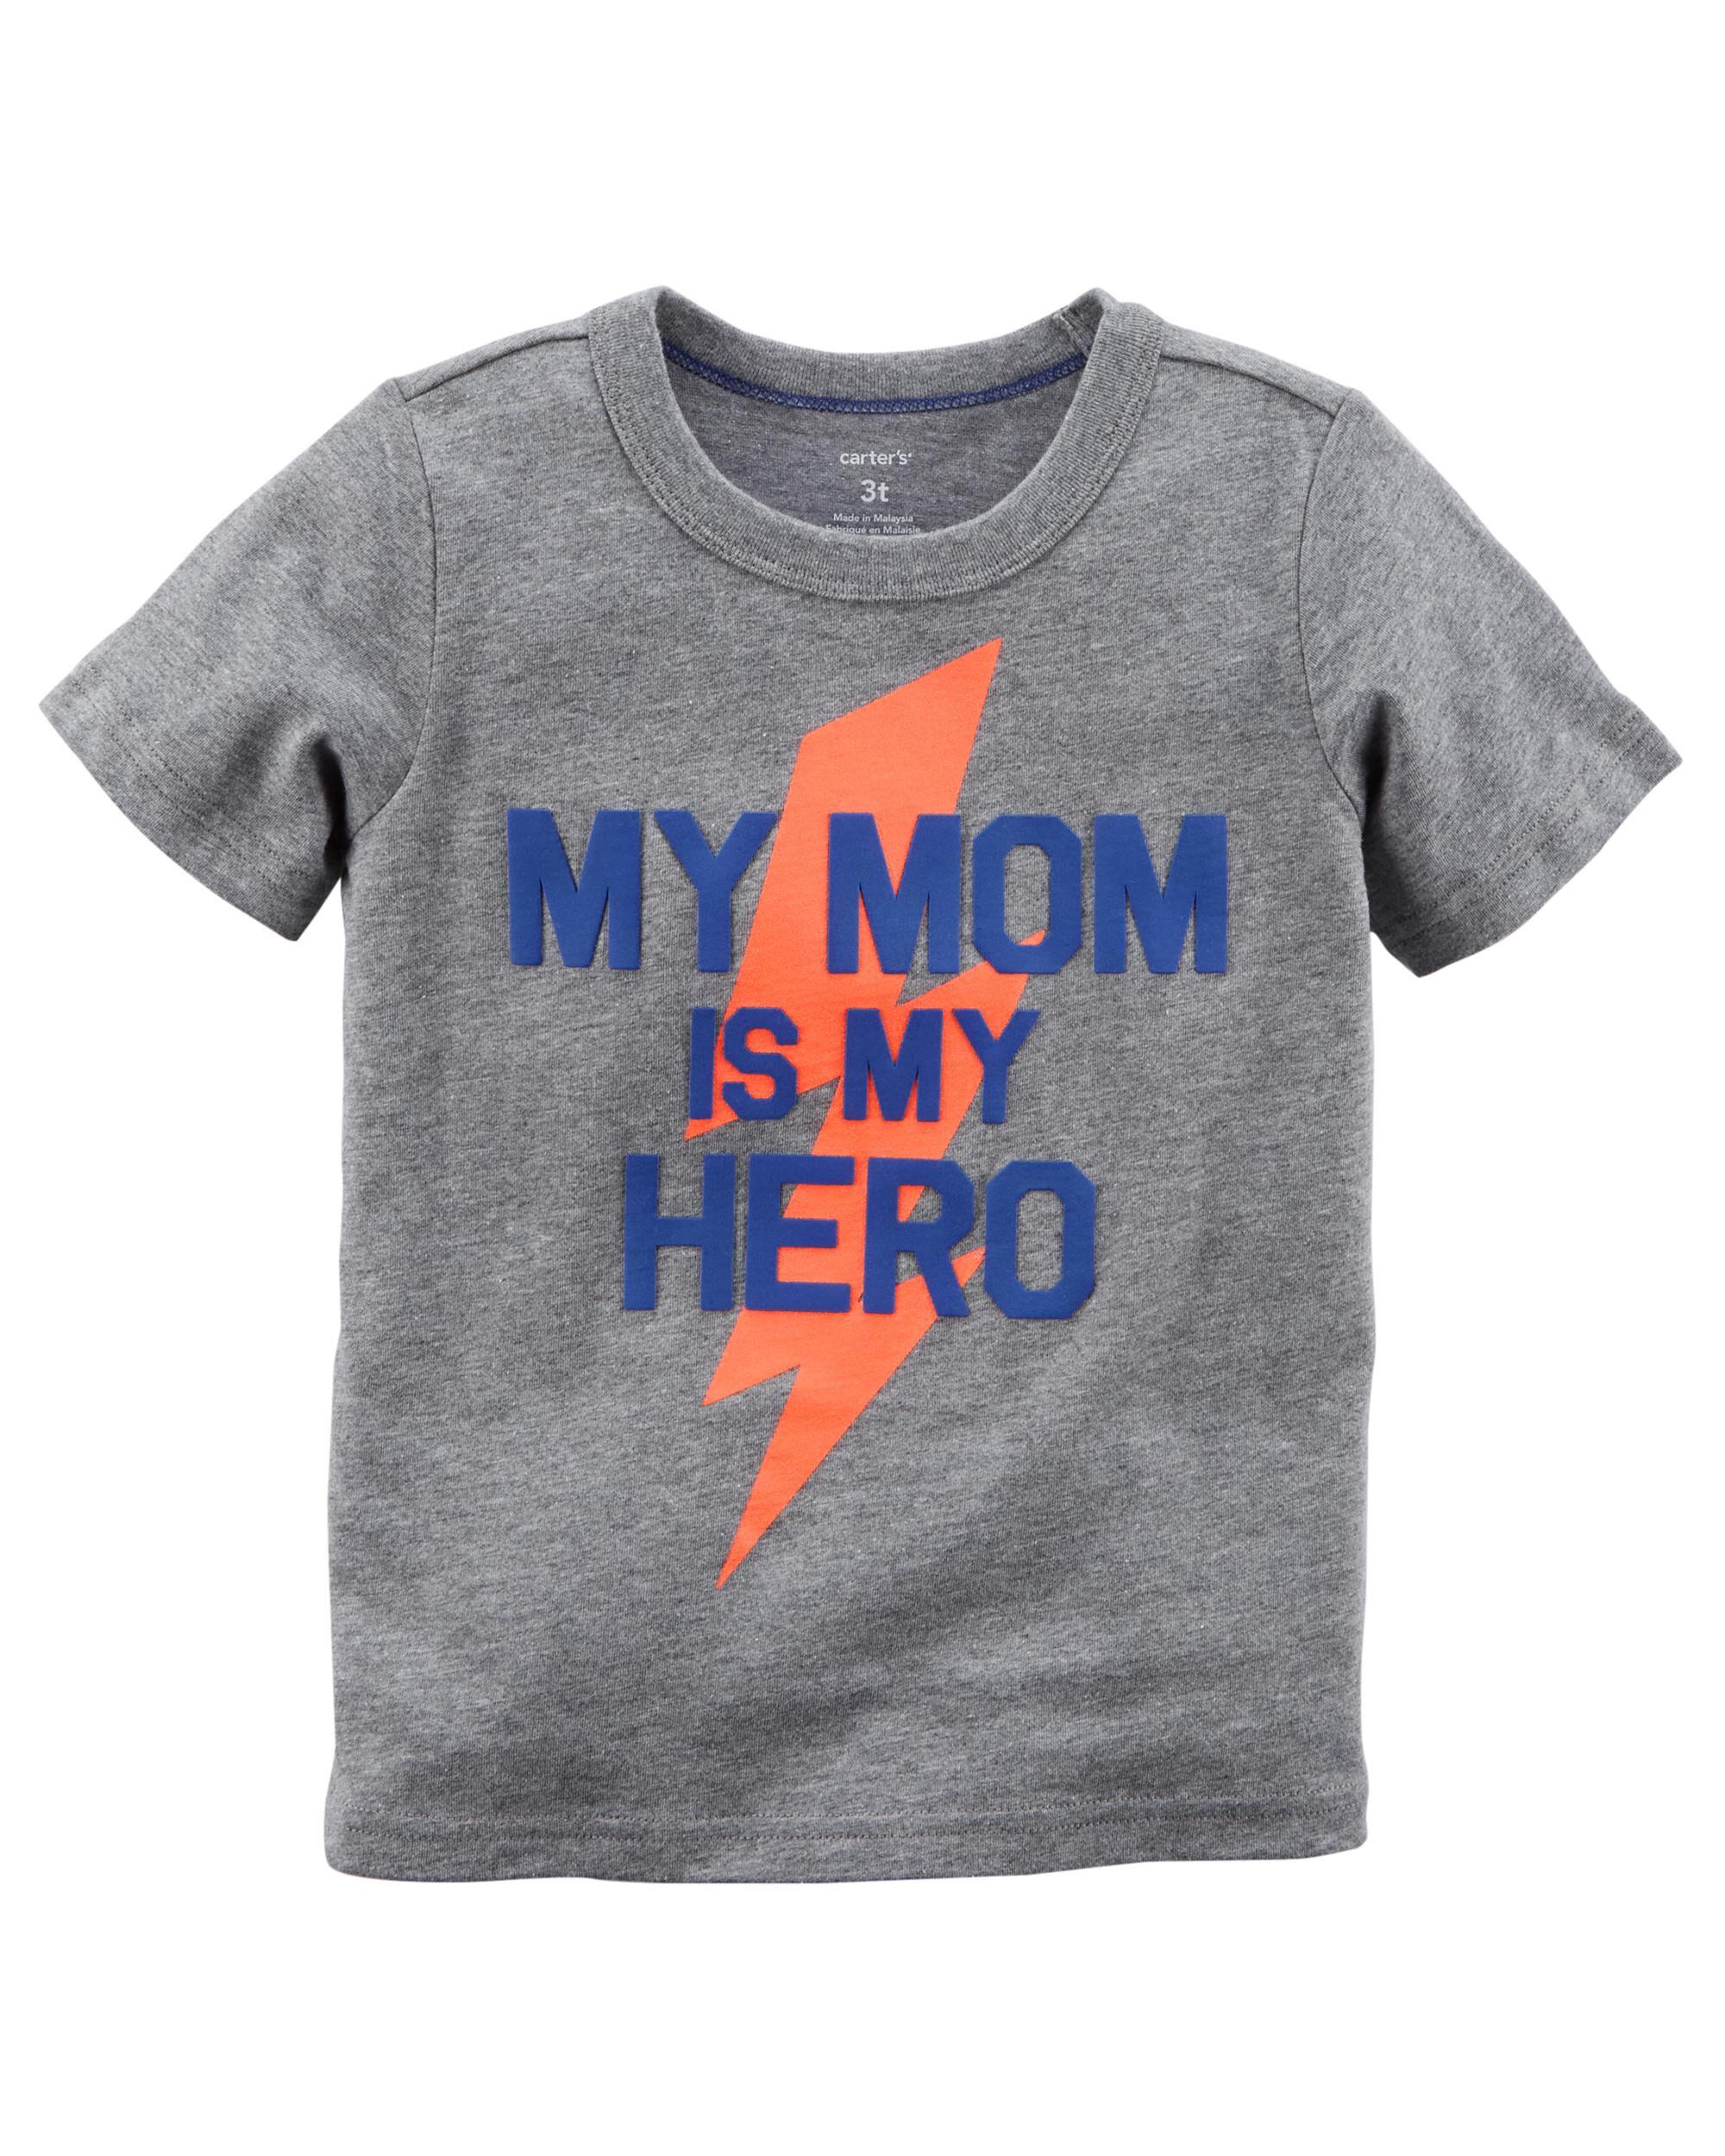 Mom Is My Hero Jersey Tee